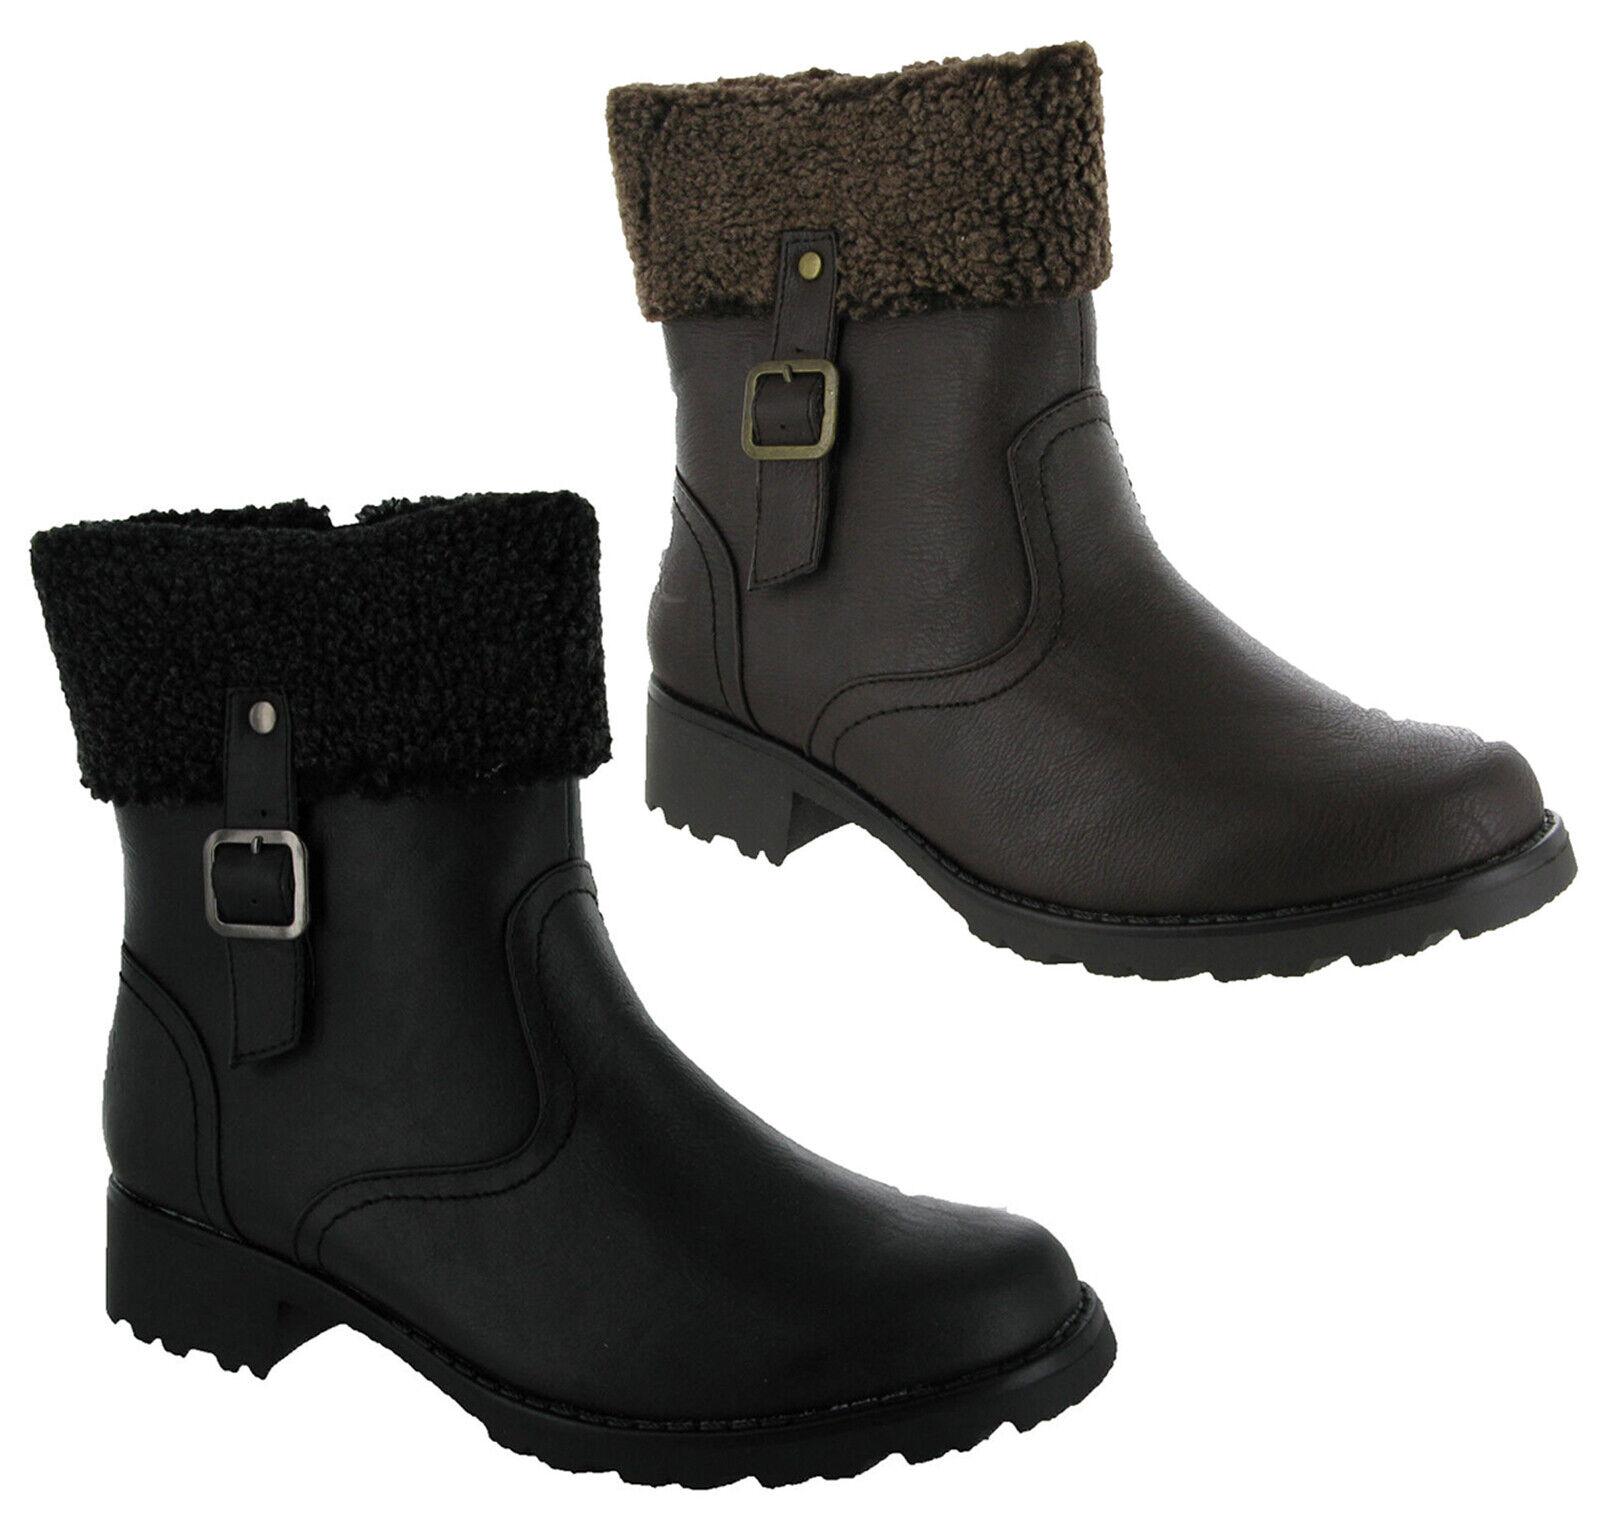 Para Mujer Suave calcetín de piel Top Negro/marr ón Moda Motociclista Tobillo cremallera botas talla 3 a 8 del Reino Unido